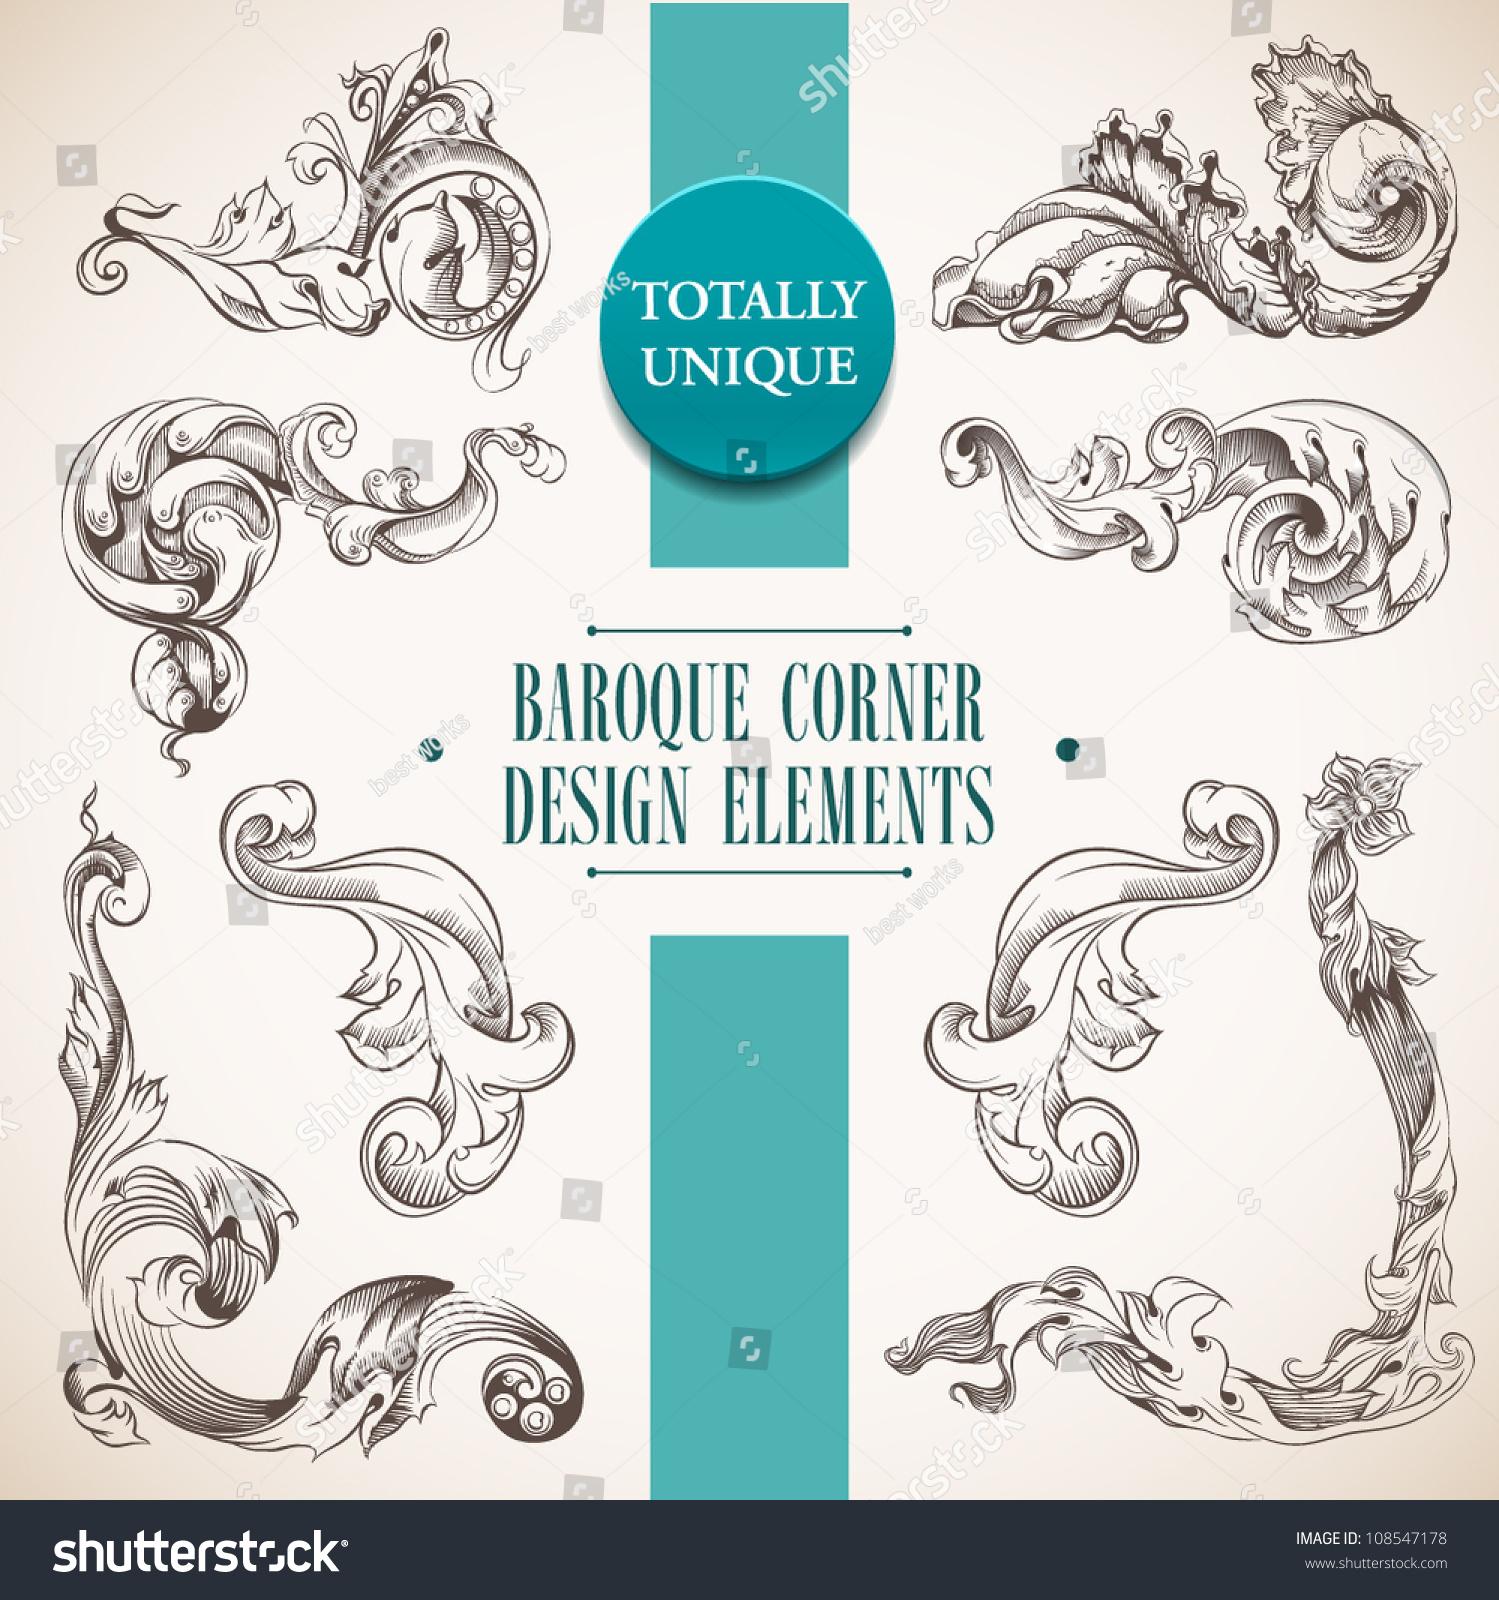 Baroque corner design elements page decoration stock for Baroque design elements